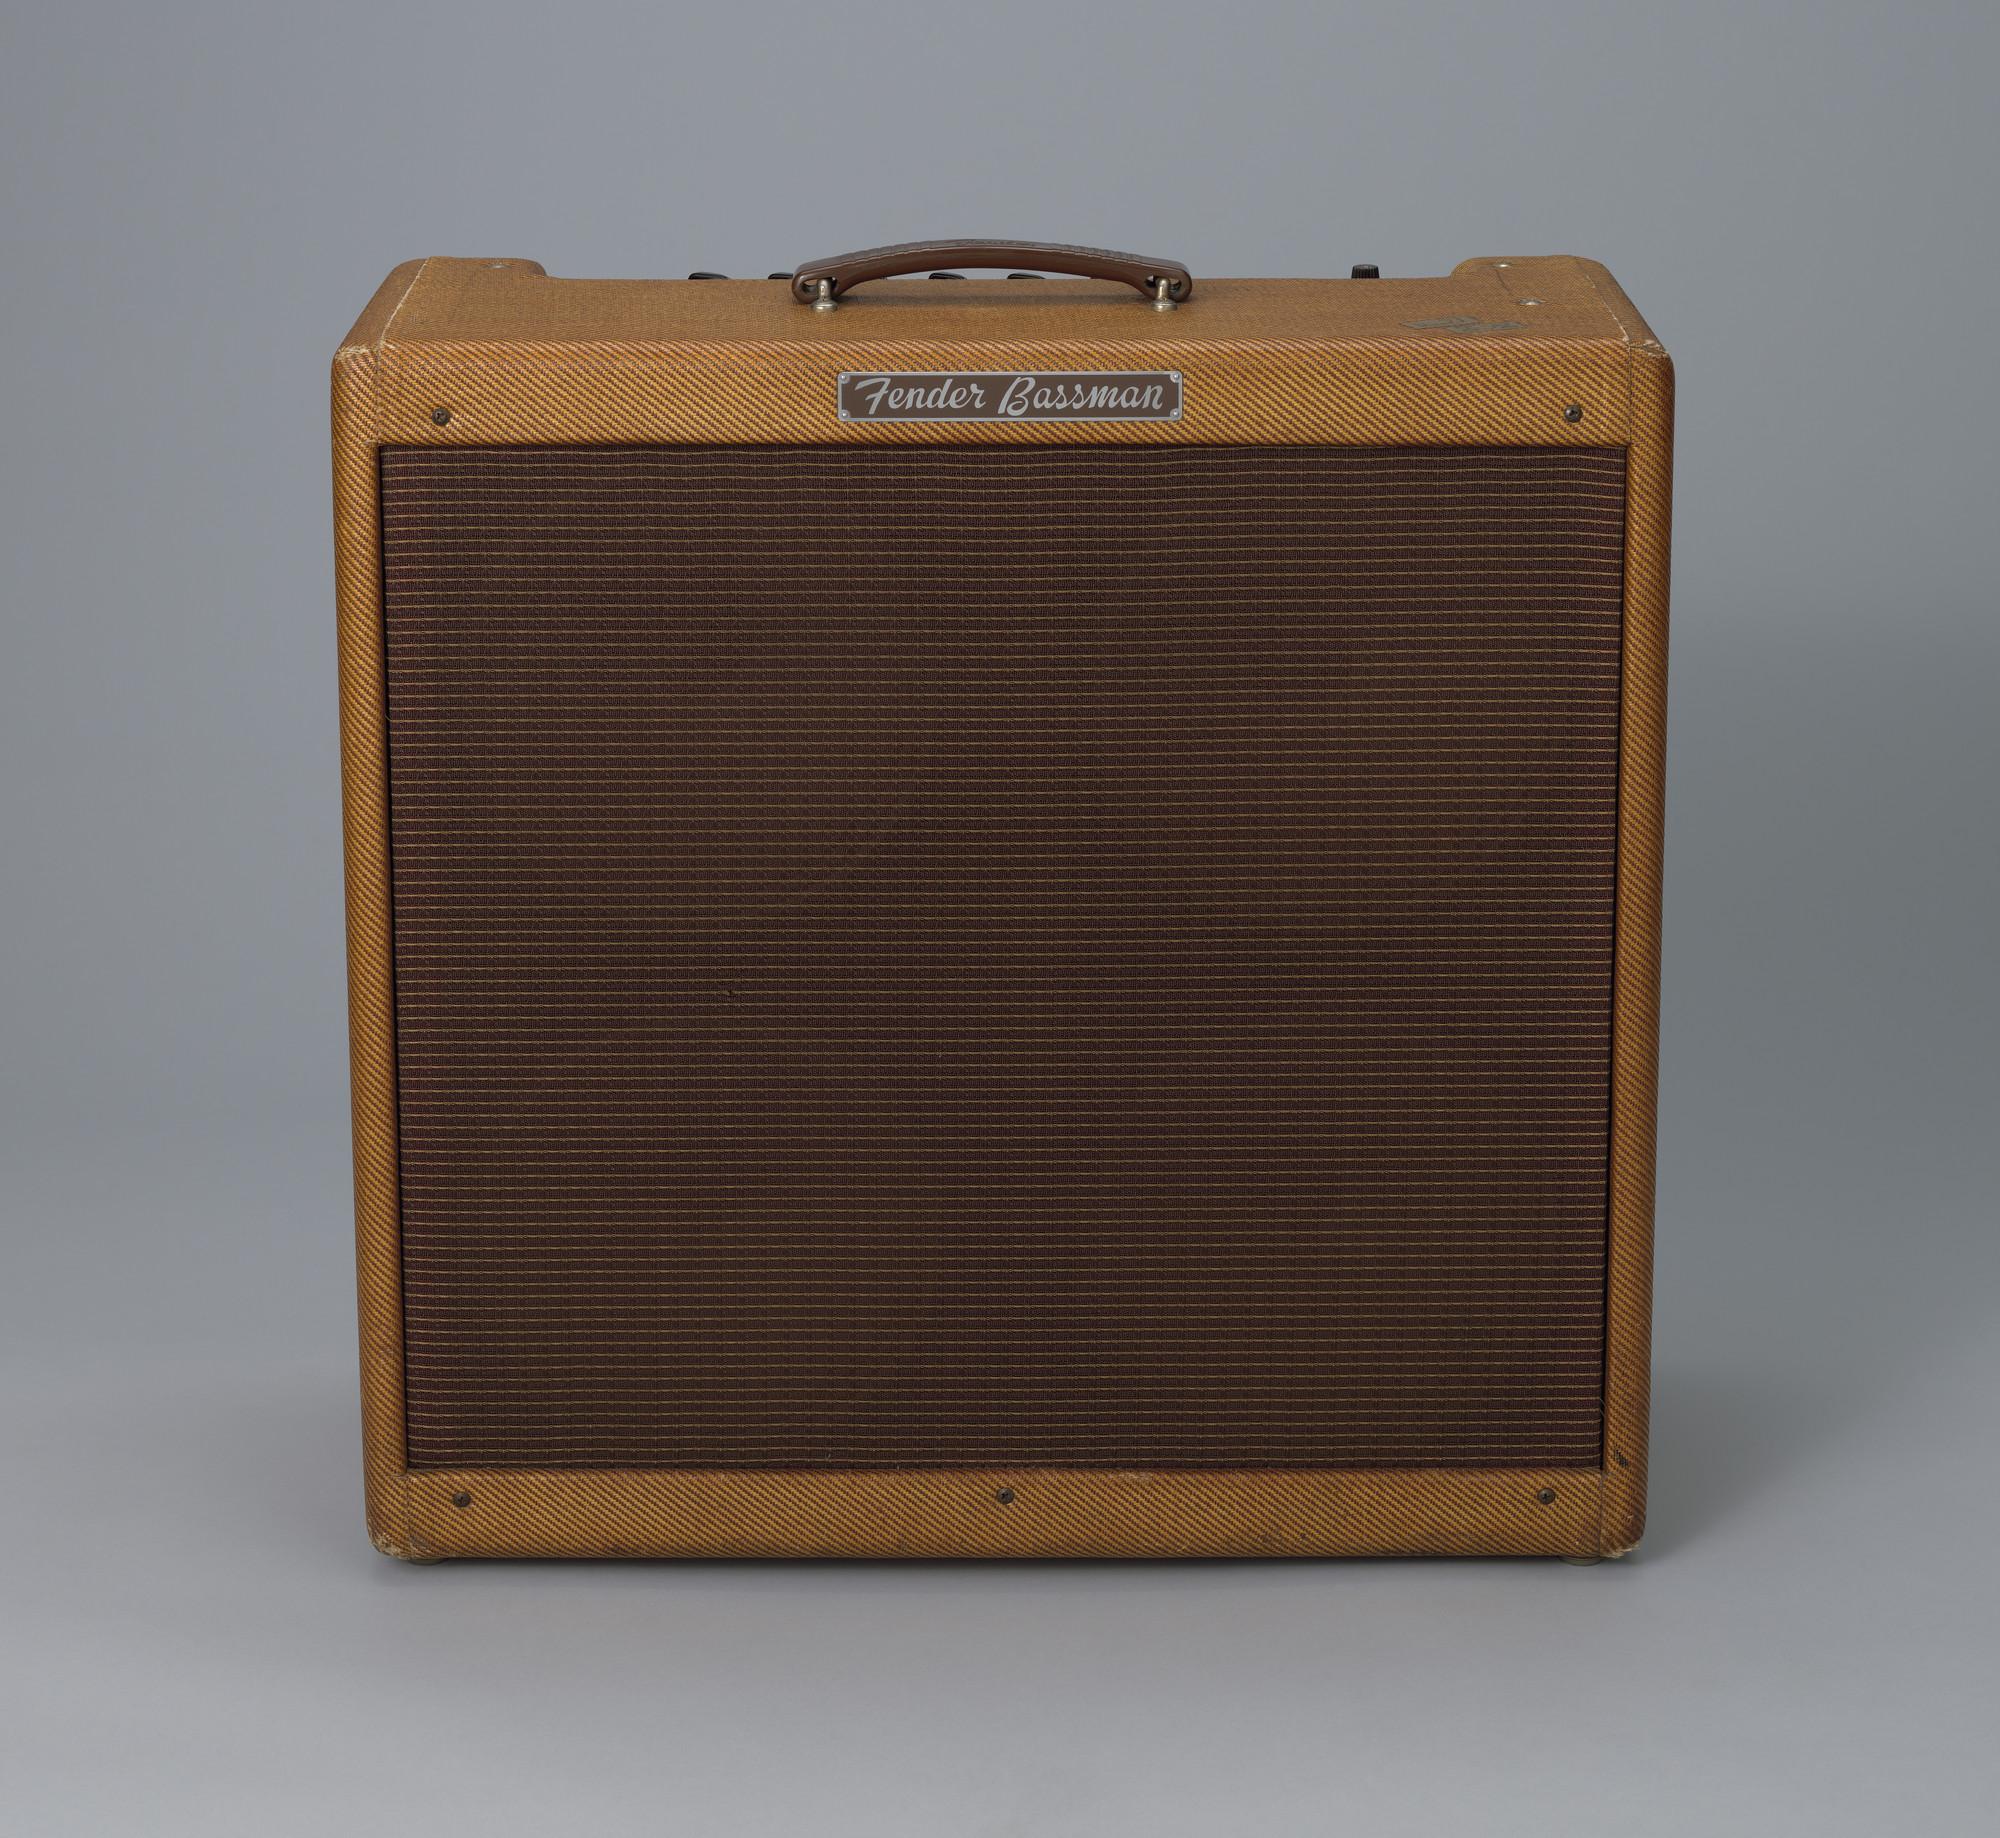 Leo Fender, George Fullerton, Freddie Tavares  Fender